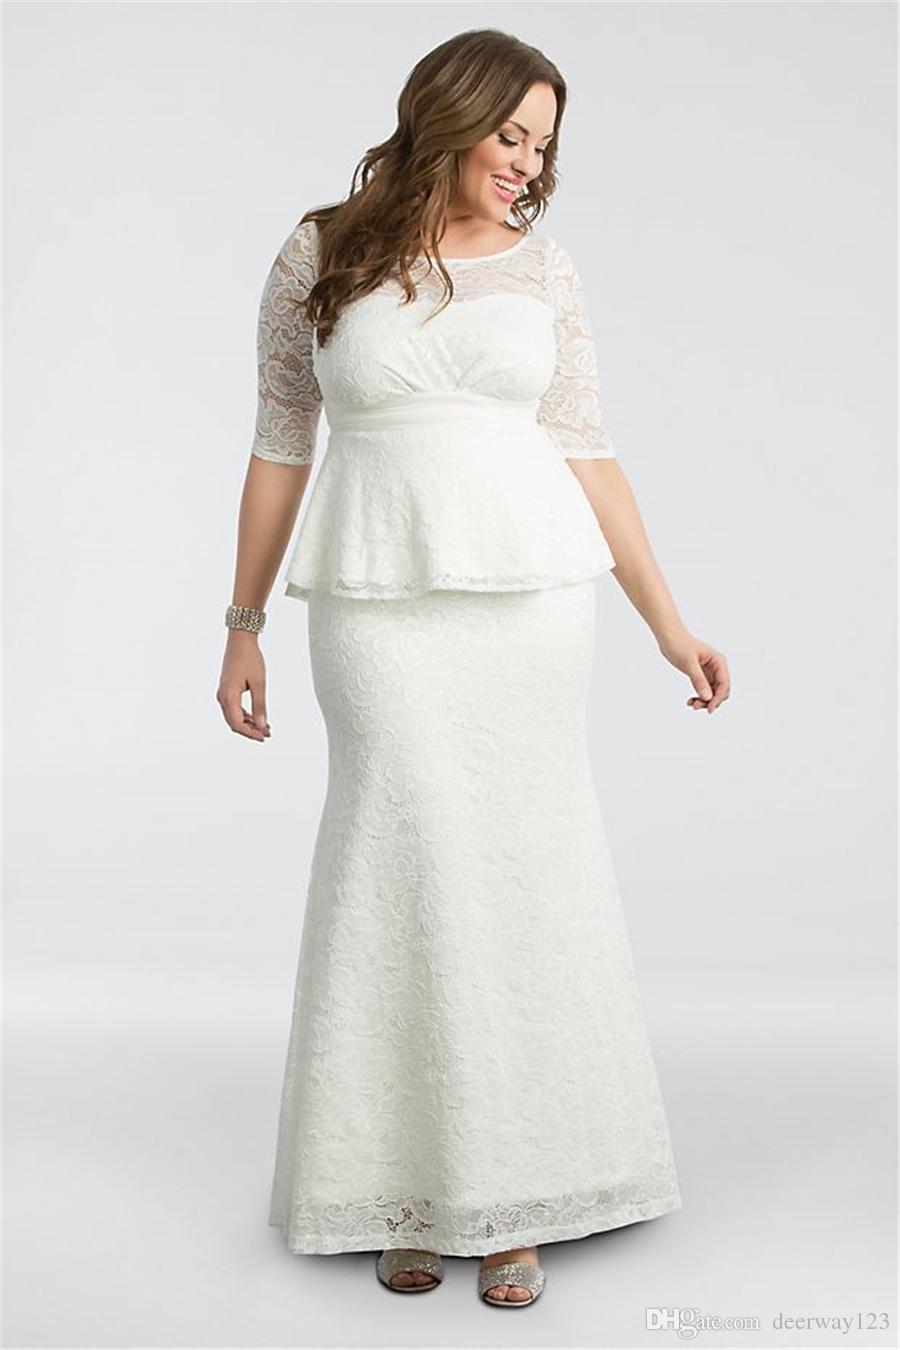 peplum plus size wedding gown 19150908 half sleeves scoop neckline mermaid  lace bridal dress floor length vestido de noiva 2019 red mermaid wedding